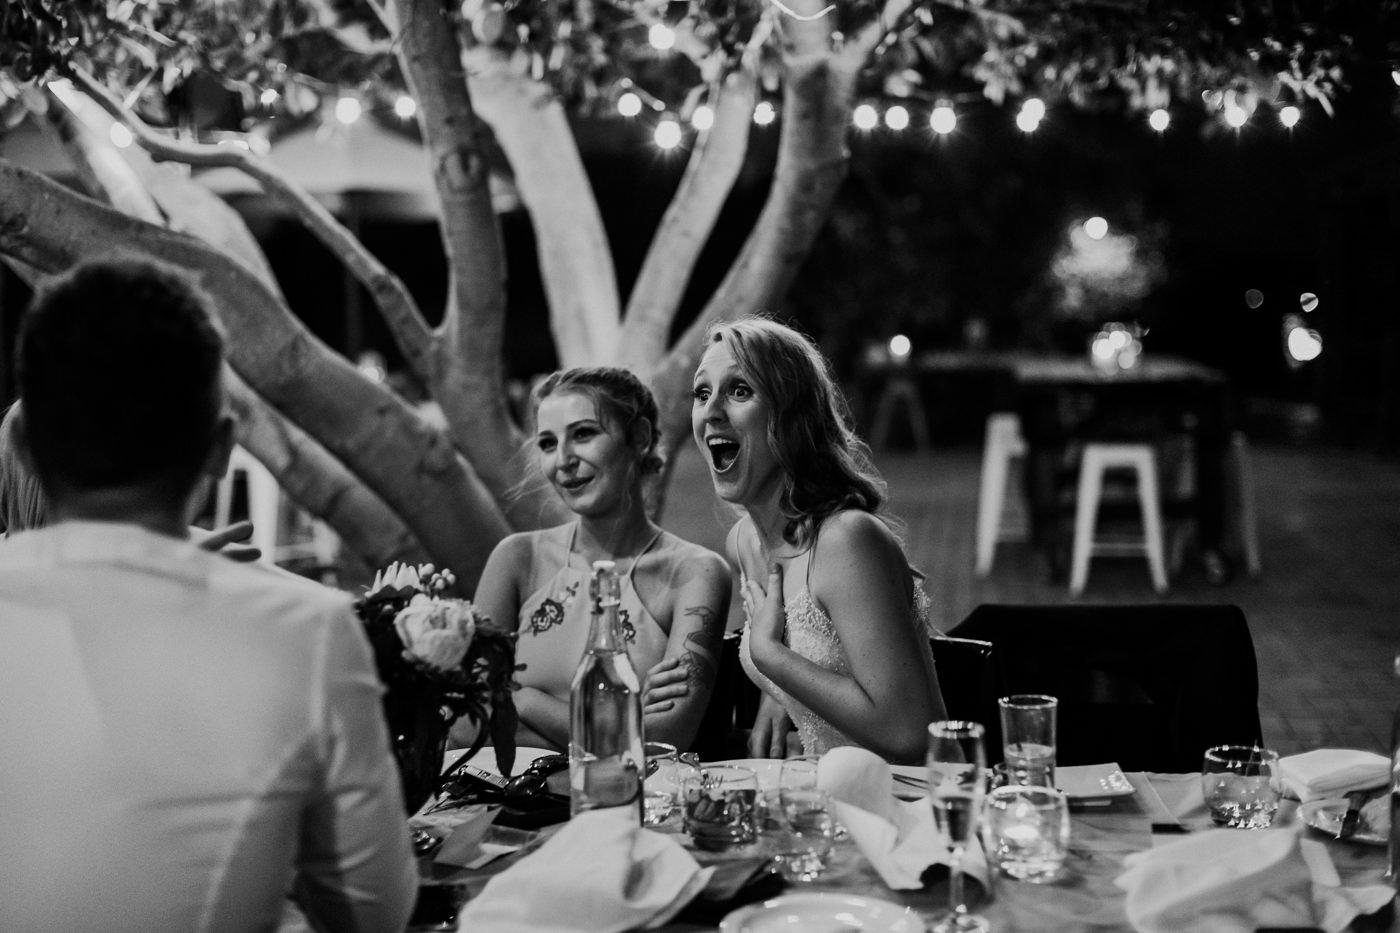 Anthony & Eliet - Wagga Wagga Wedding - Country NSW - Samantha Heather Photography-178.jpg